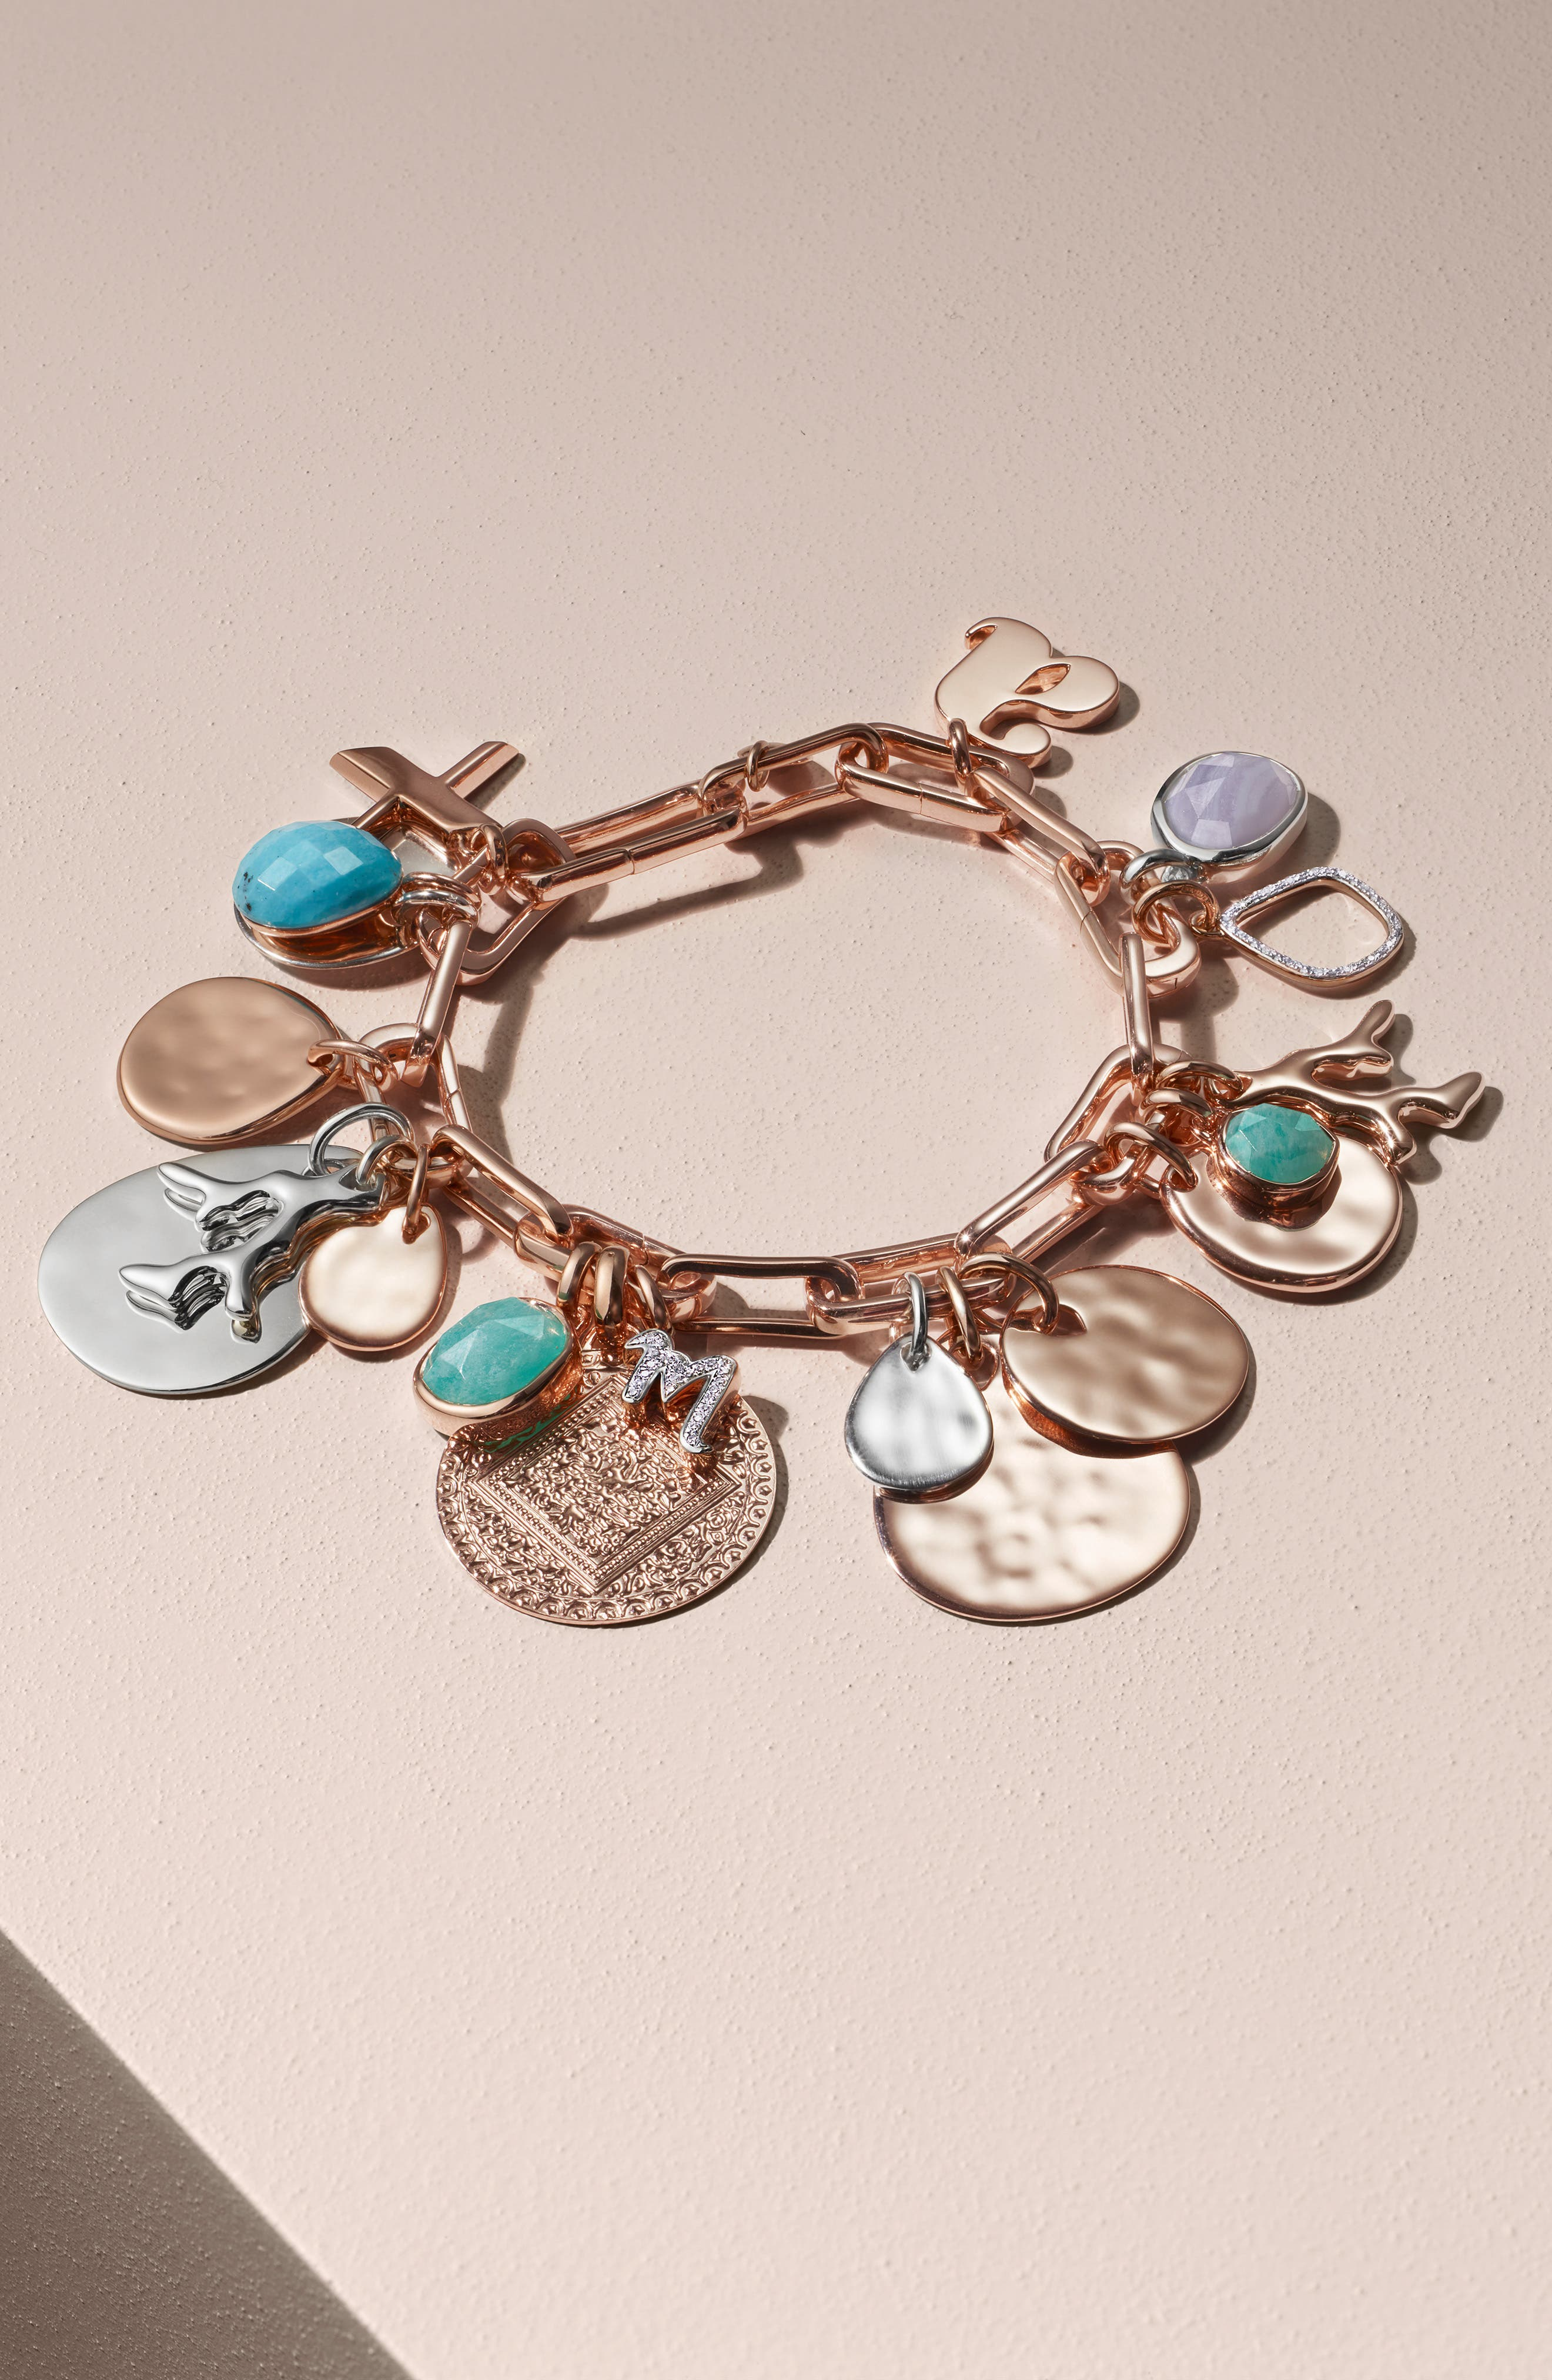 Alta Capture Link Chain Bracelet,                             Alternate thumbnail 9, color,                             ROSE GOLD